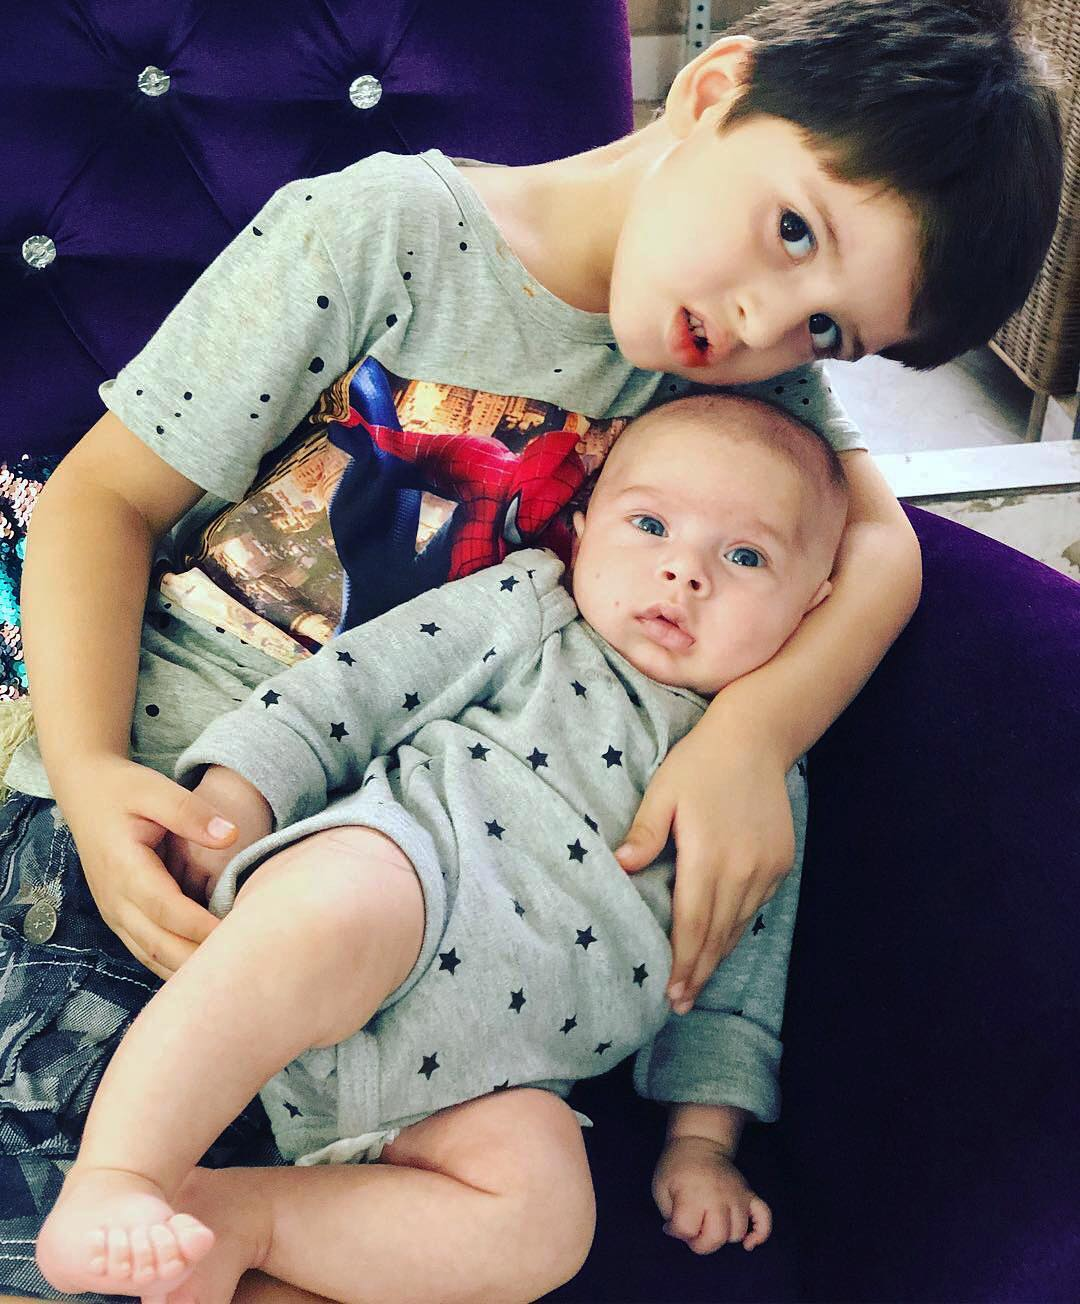 Awesome Shots of Mahbir - Baby of Fatima Effendi and Kanwar Arsalan